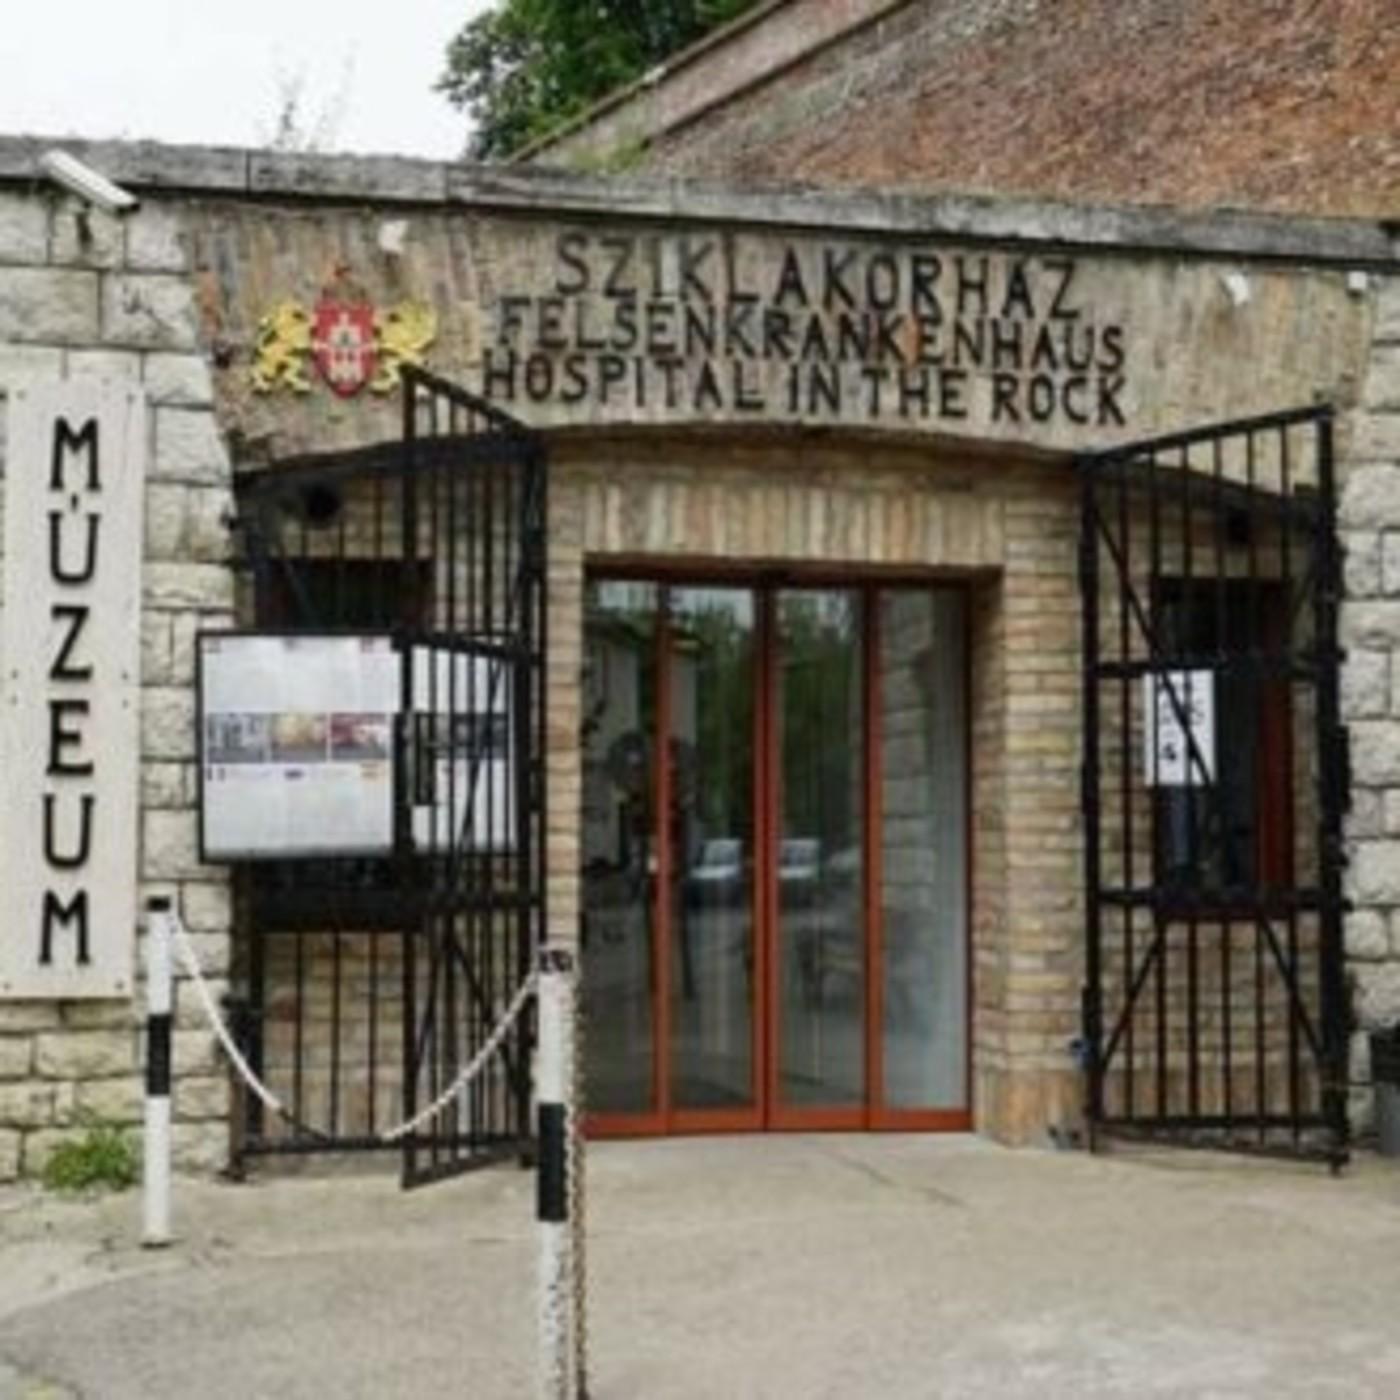 Planeta Zero - 33 - El Hospital en la Roca de Budapest